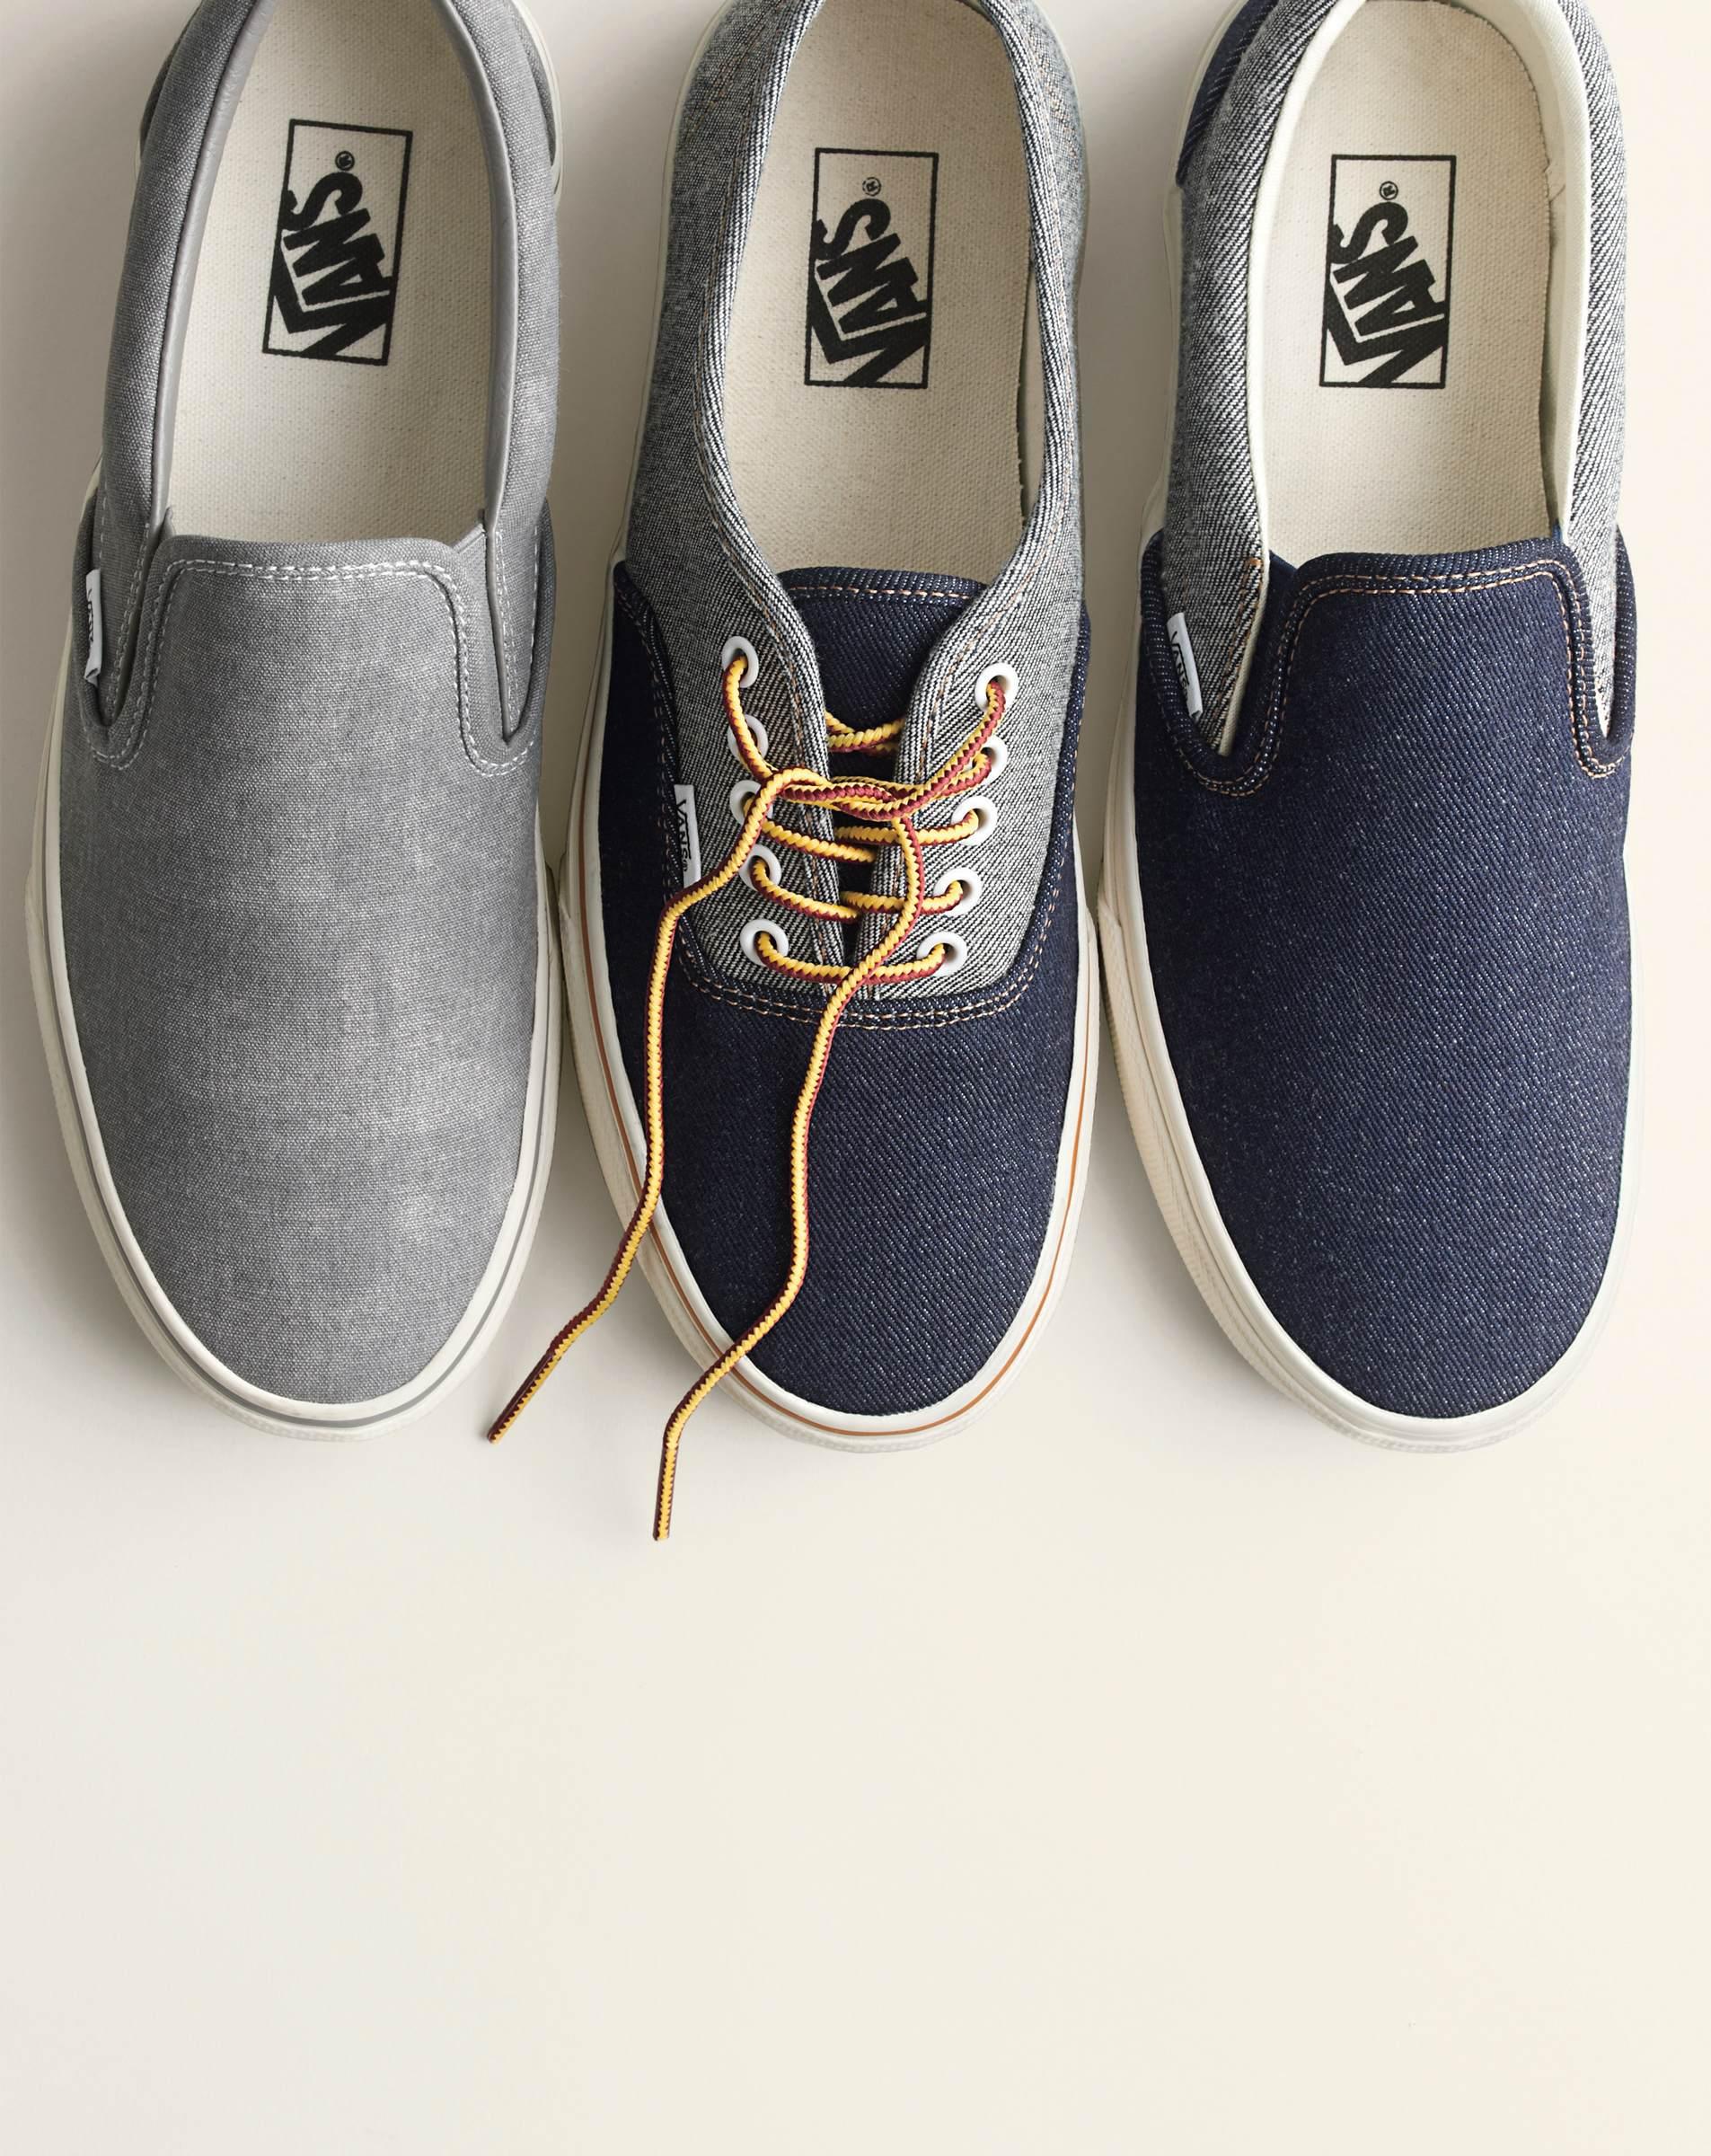 Vans_still_life_photography_sneakers.jpg